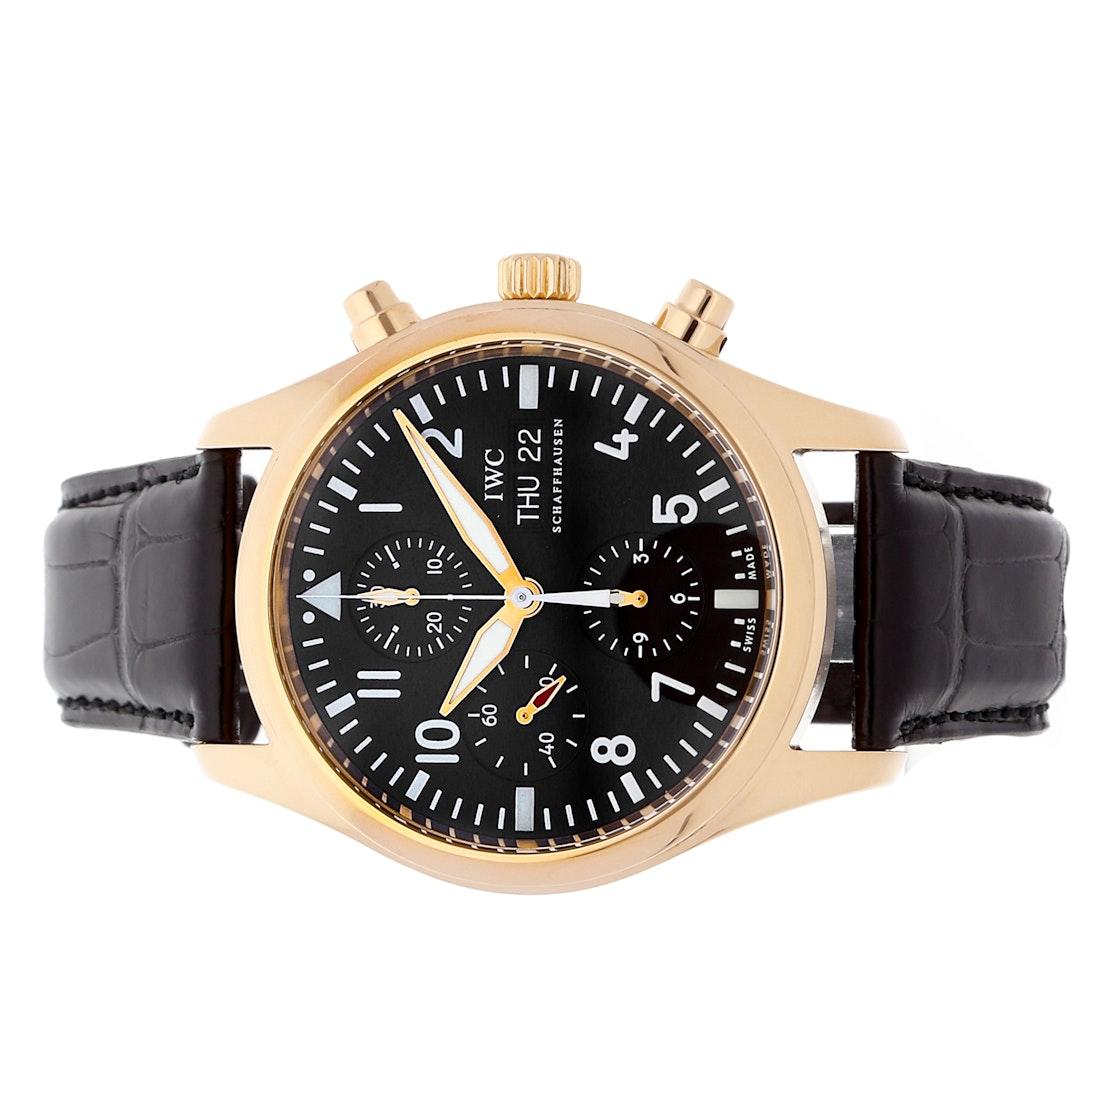 IWC Pilot's Watch Chronograph IW3717-13